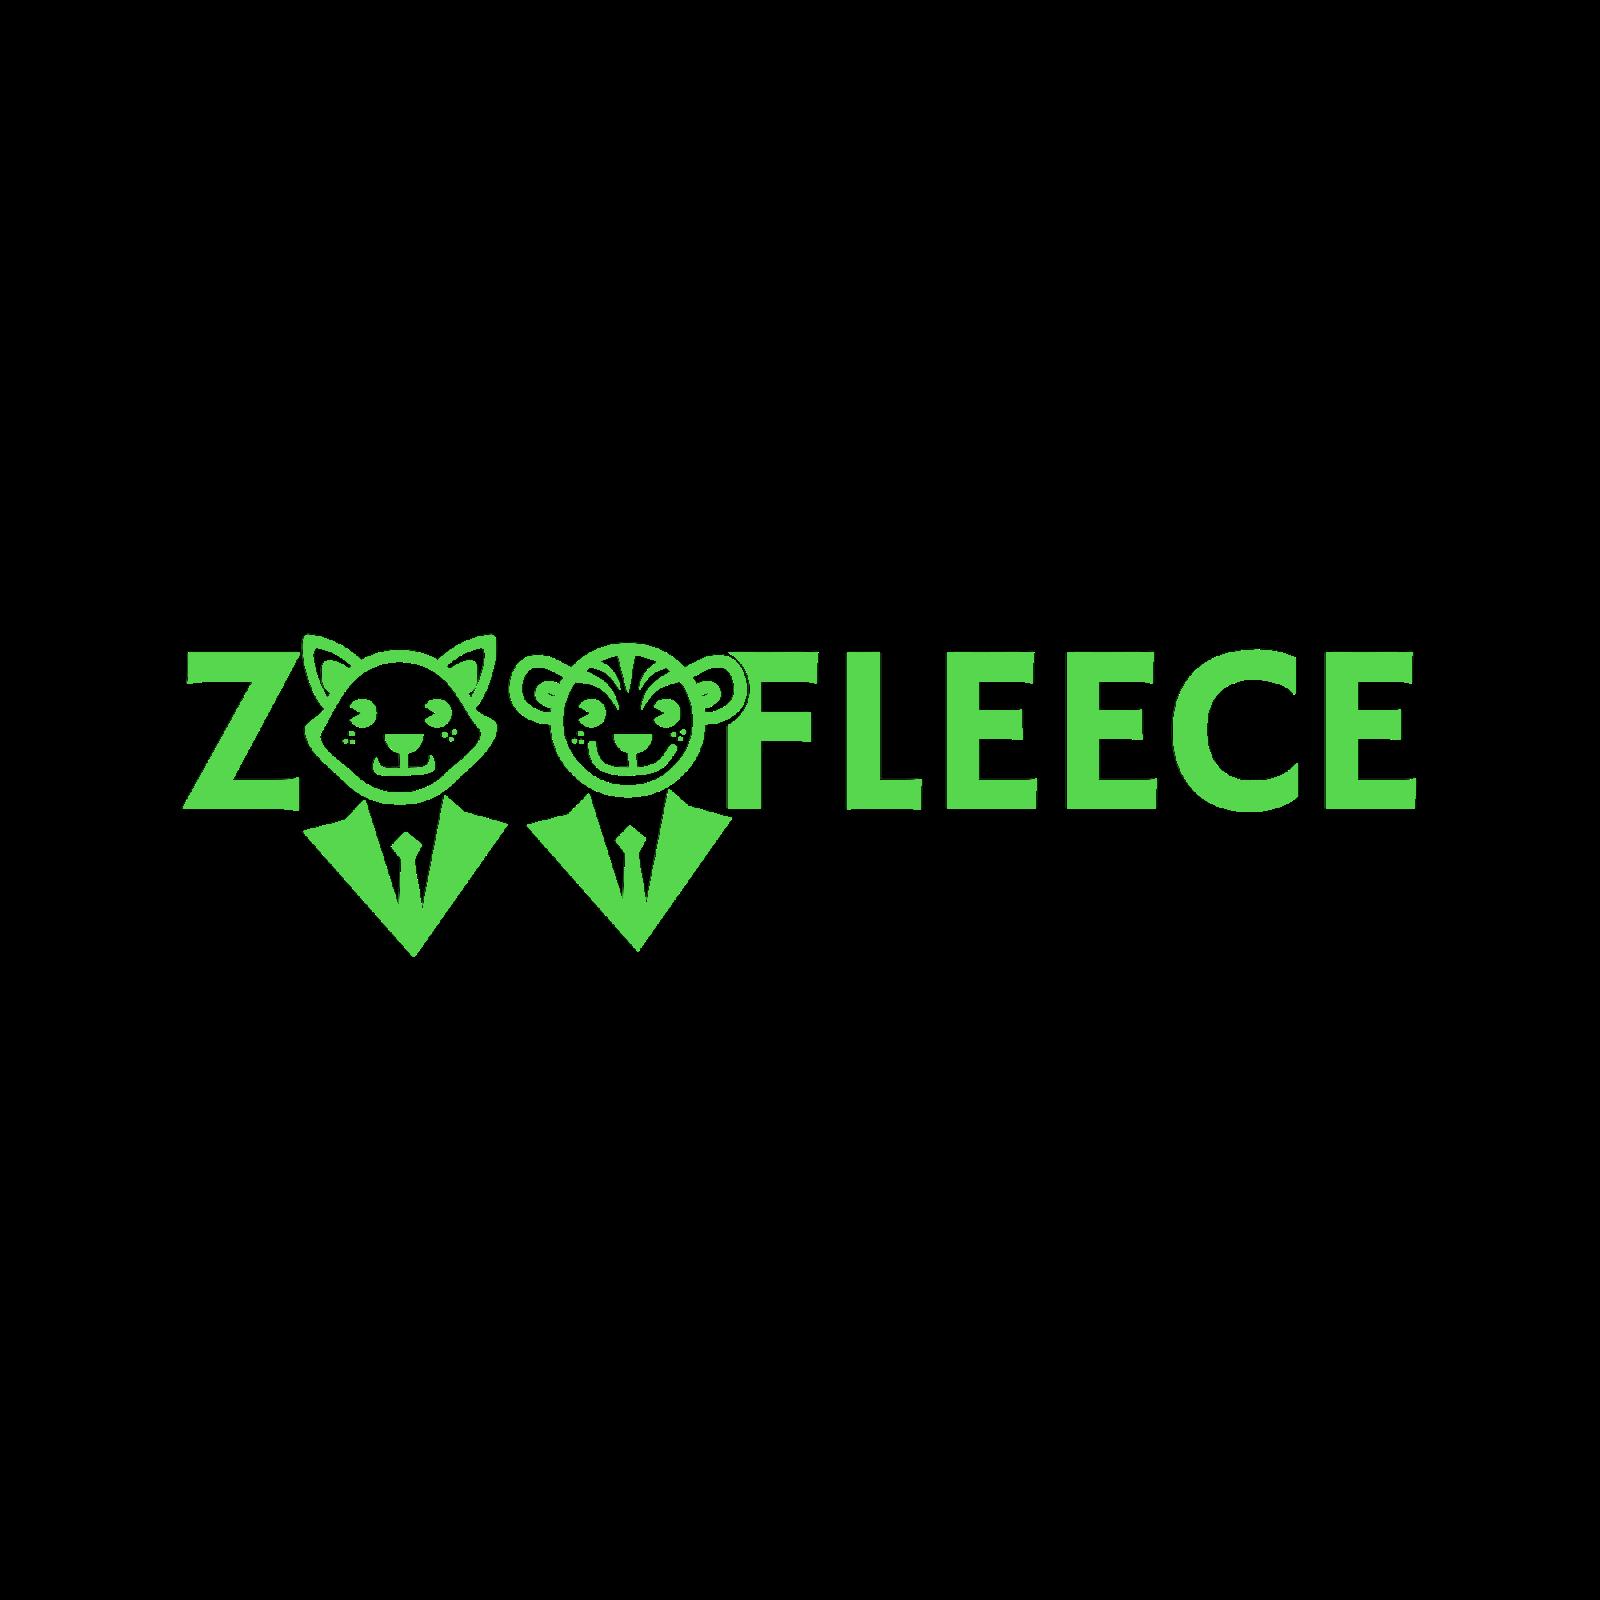 ZooFleece Shadow Grass Camouflage Kids Waterfowl Reversible Jacket Hoodie Coat 3